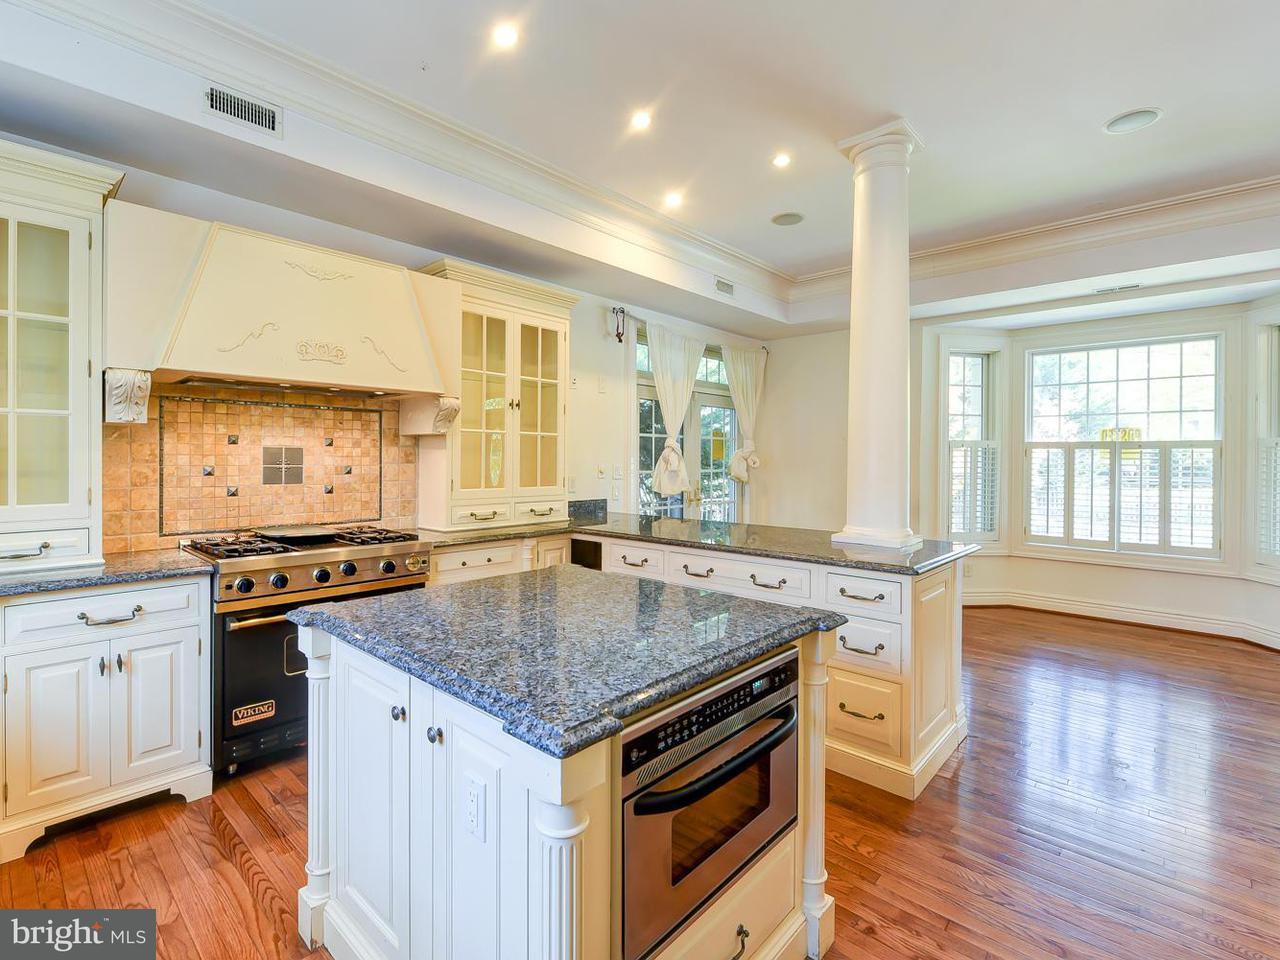 Additional photo for property listing at 4301 BRANDYWINE ST NW 4301 BRANDYWINE ST NW Washington, 컬럼비아주 20016 미국